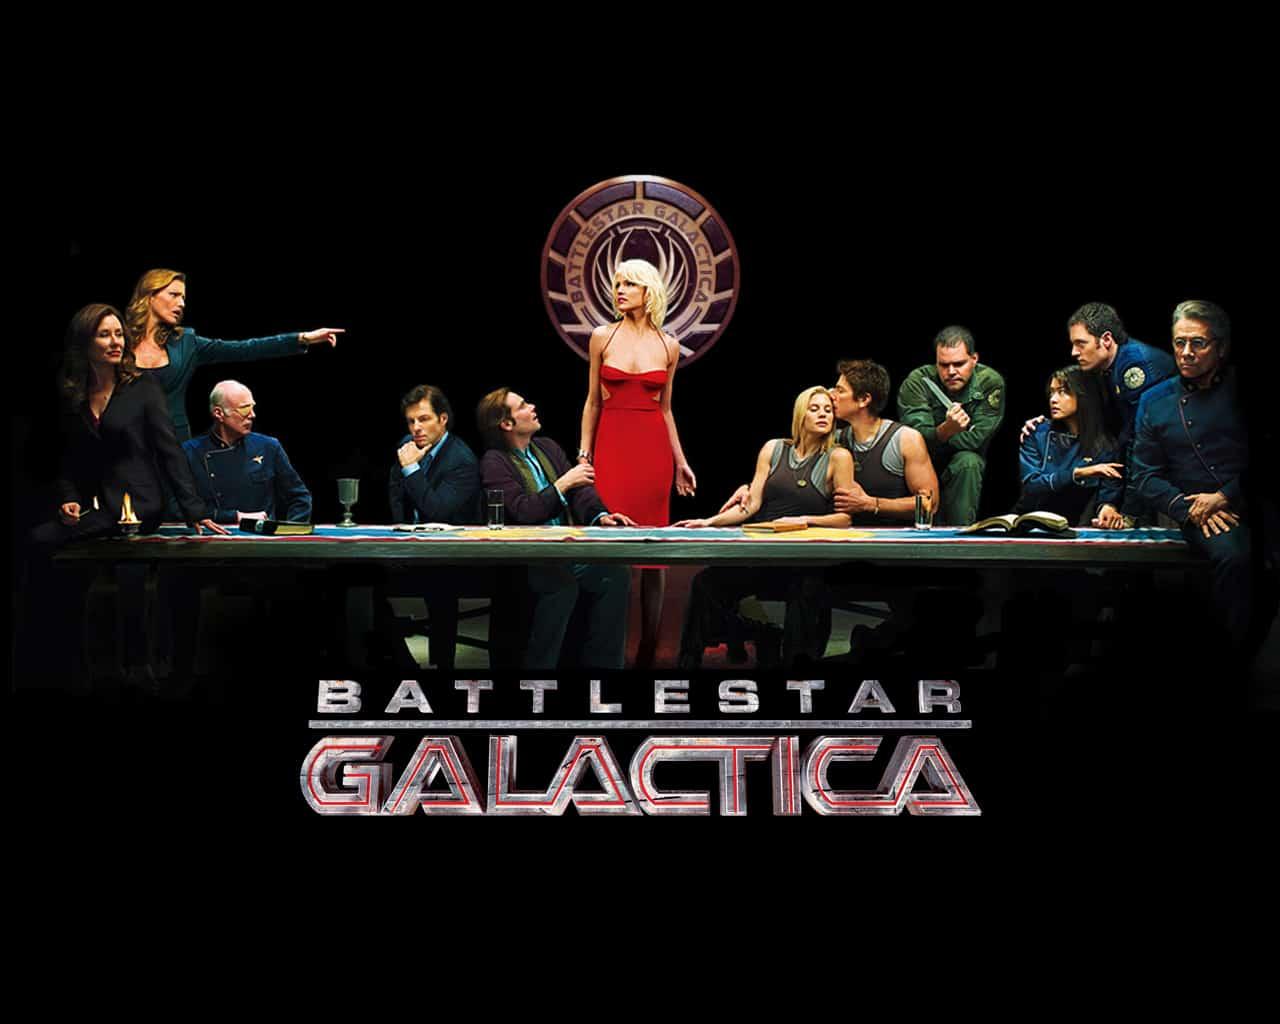 battlestar-galactica-w_0